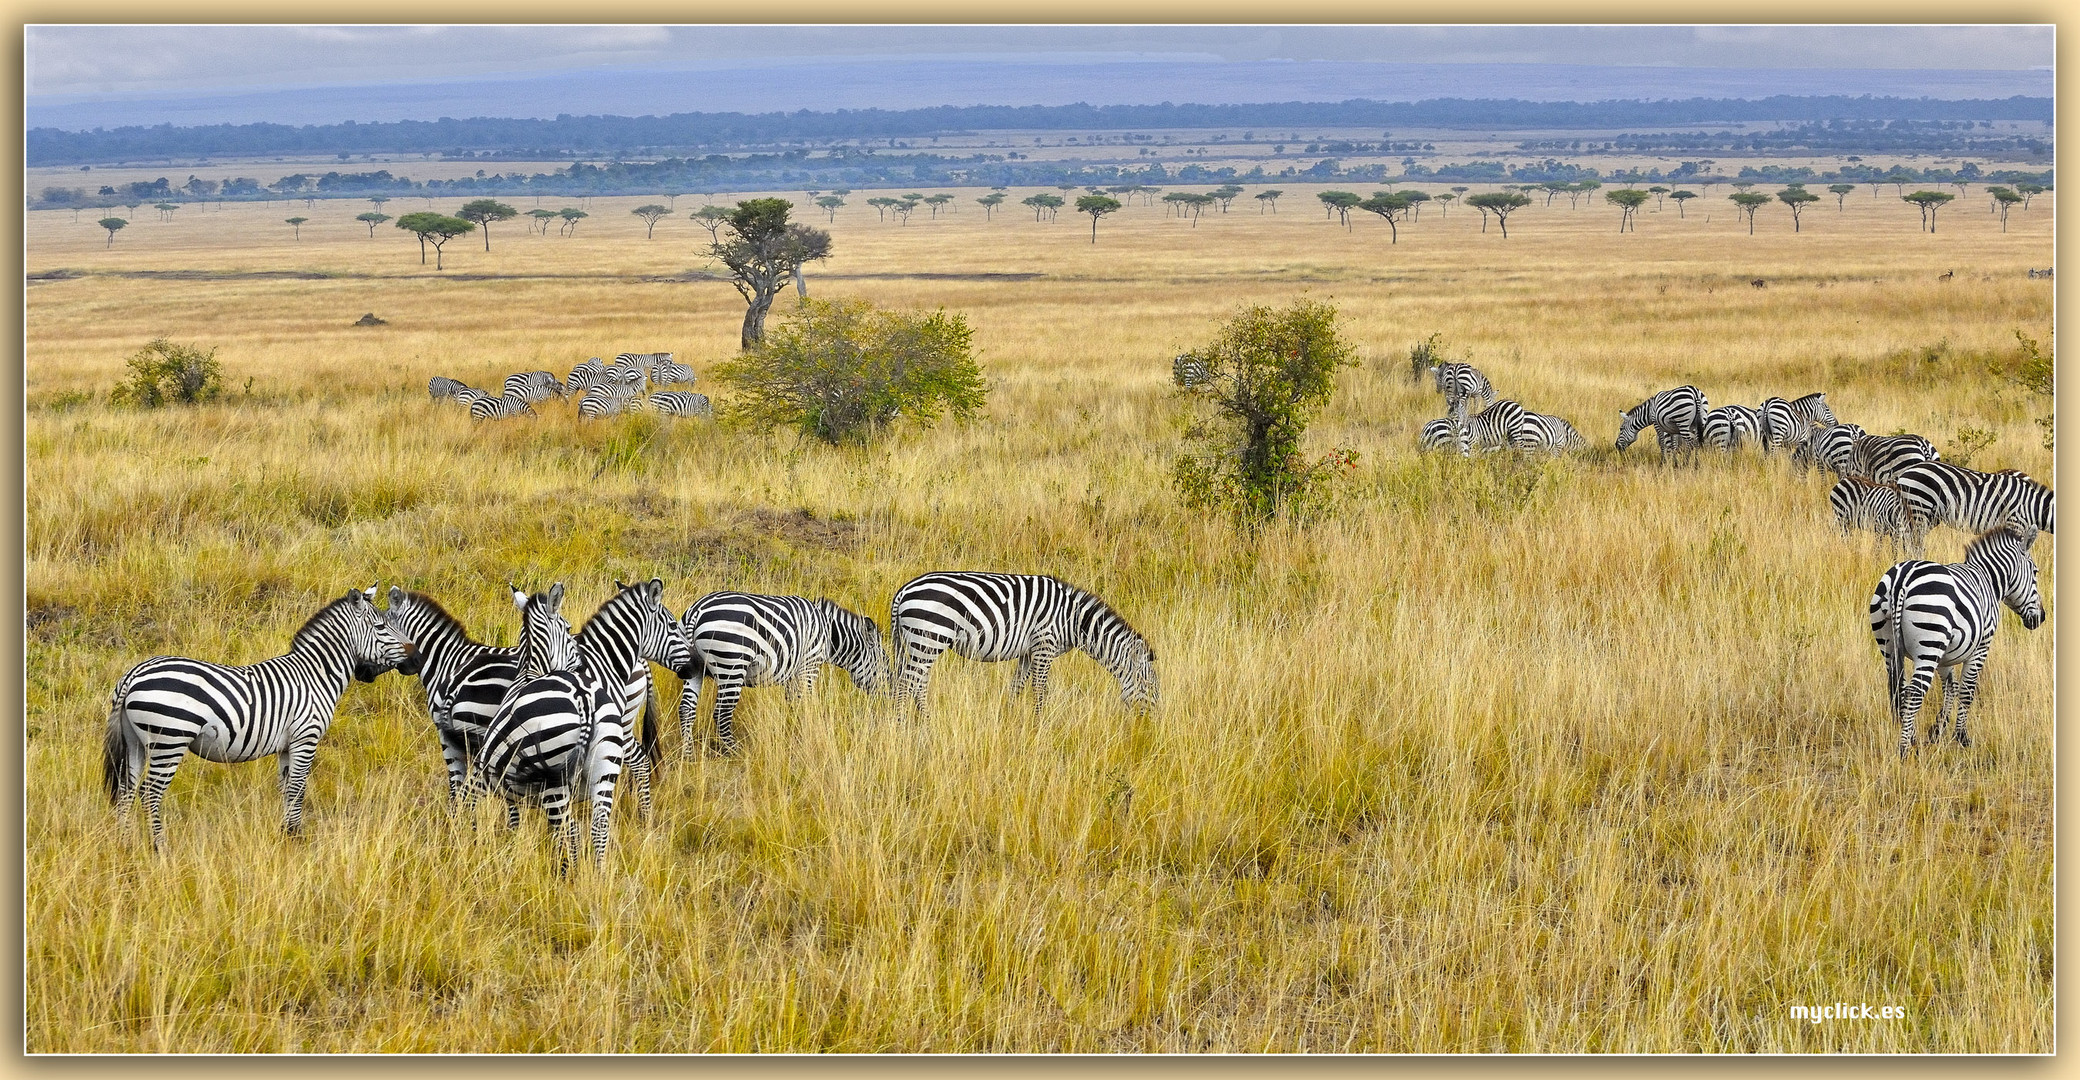 MEMORIAS DE AFRICA-CEBRAS EN LA SABANA -PN DE MASAI MARA -KENIA